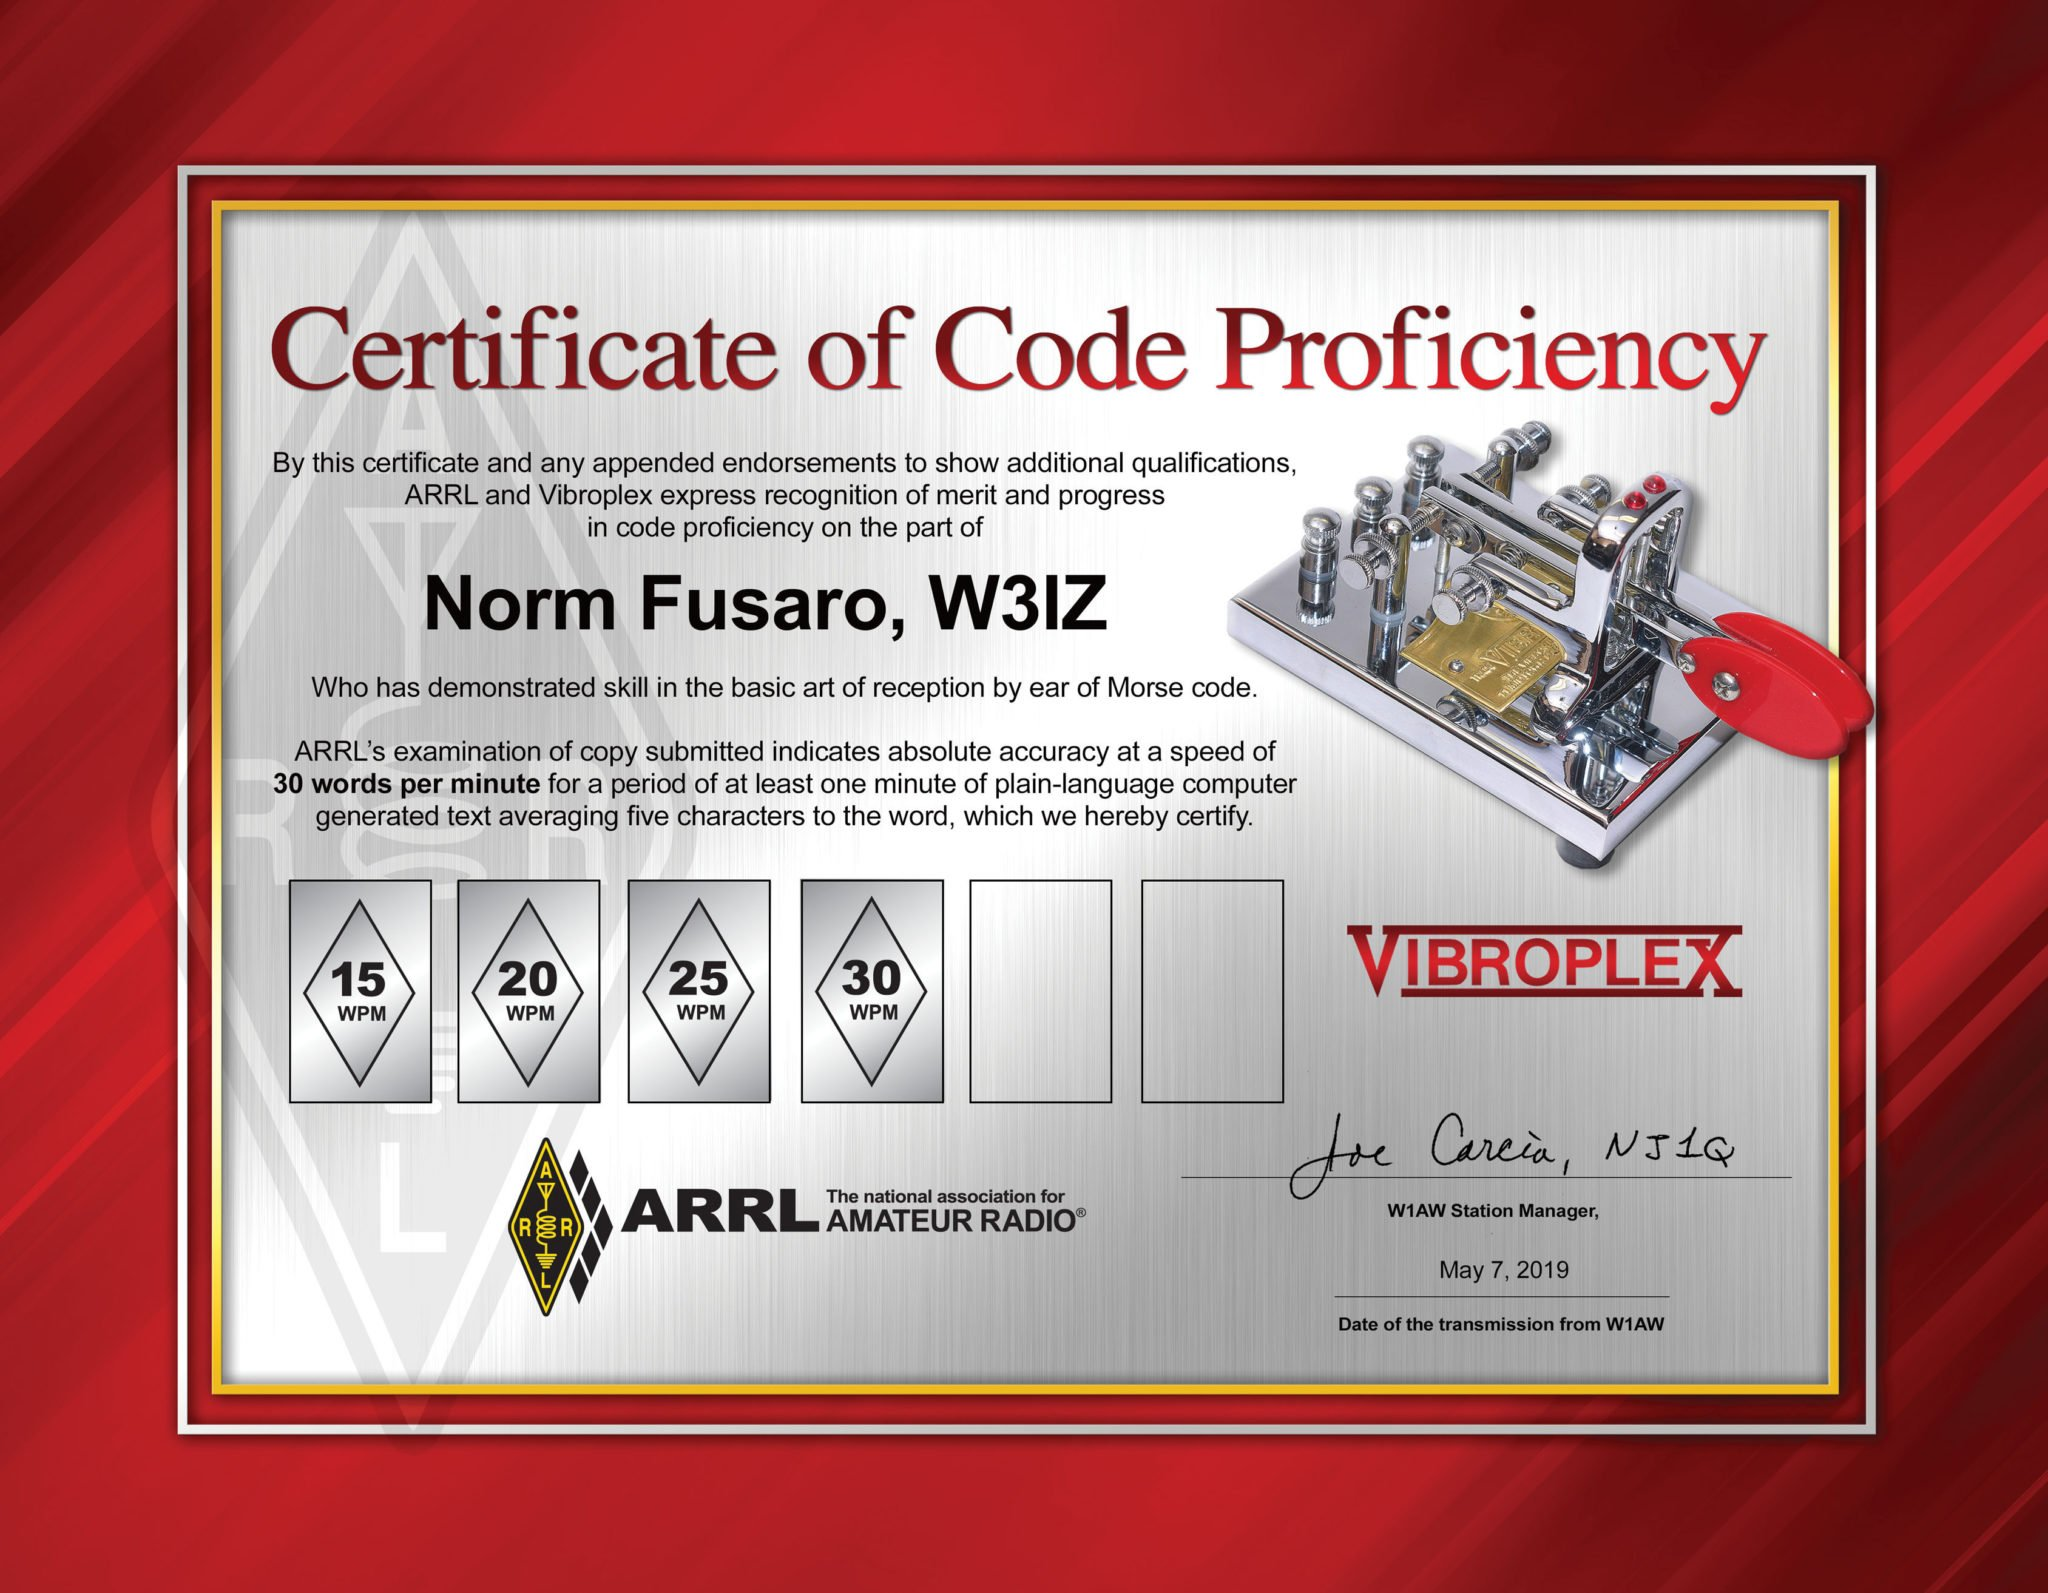 ARRL Amping up Code Proficiency Awards - KB6NU's Ham Radio Blog